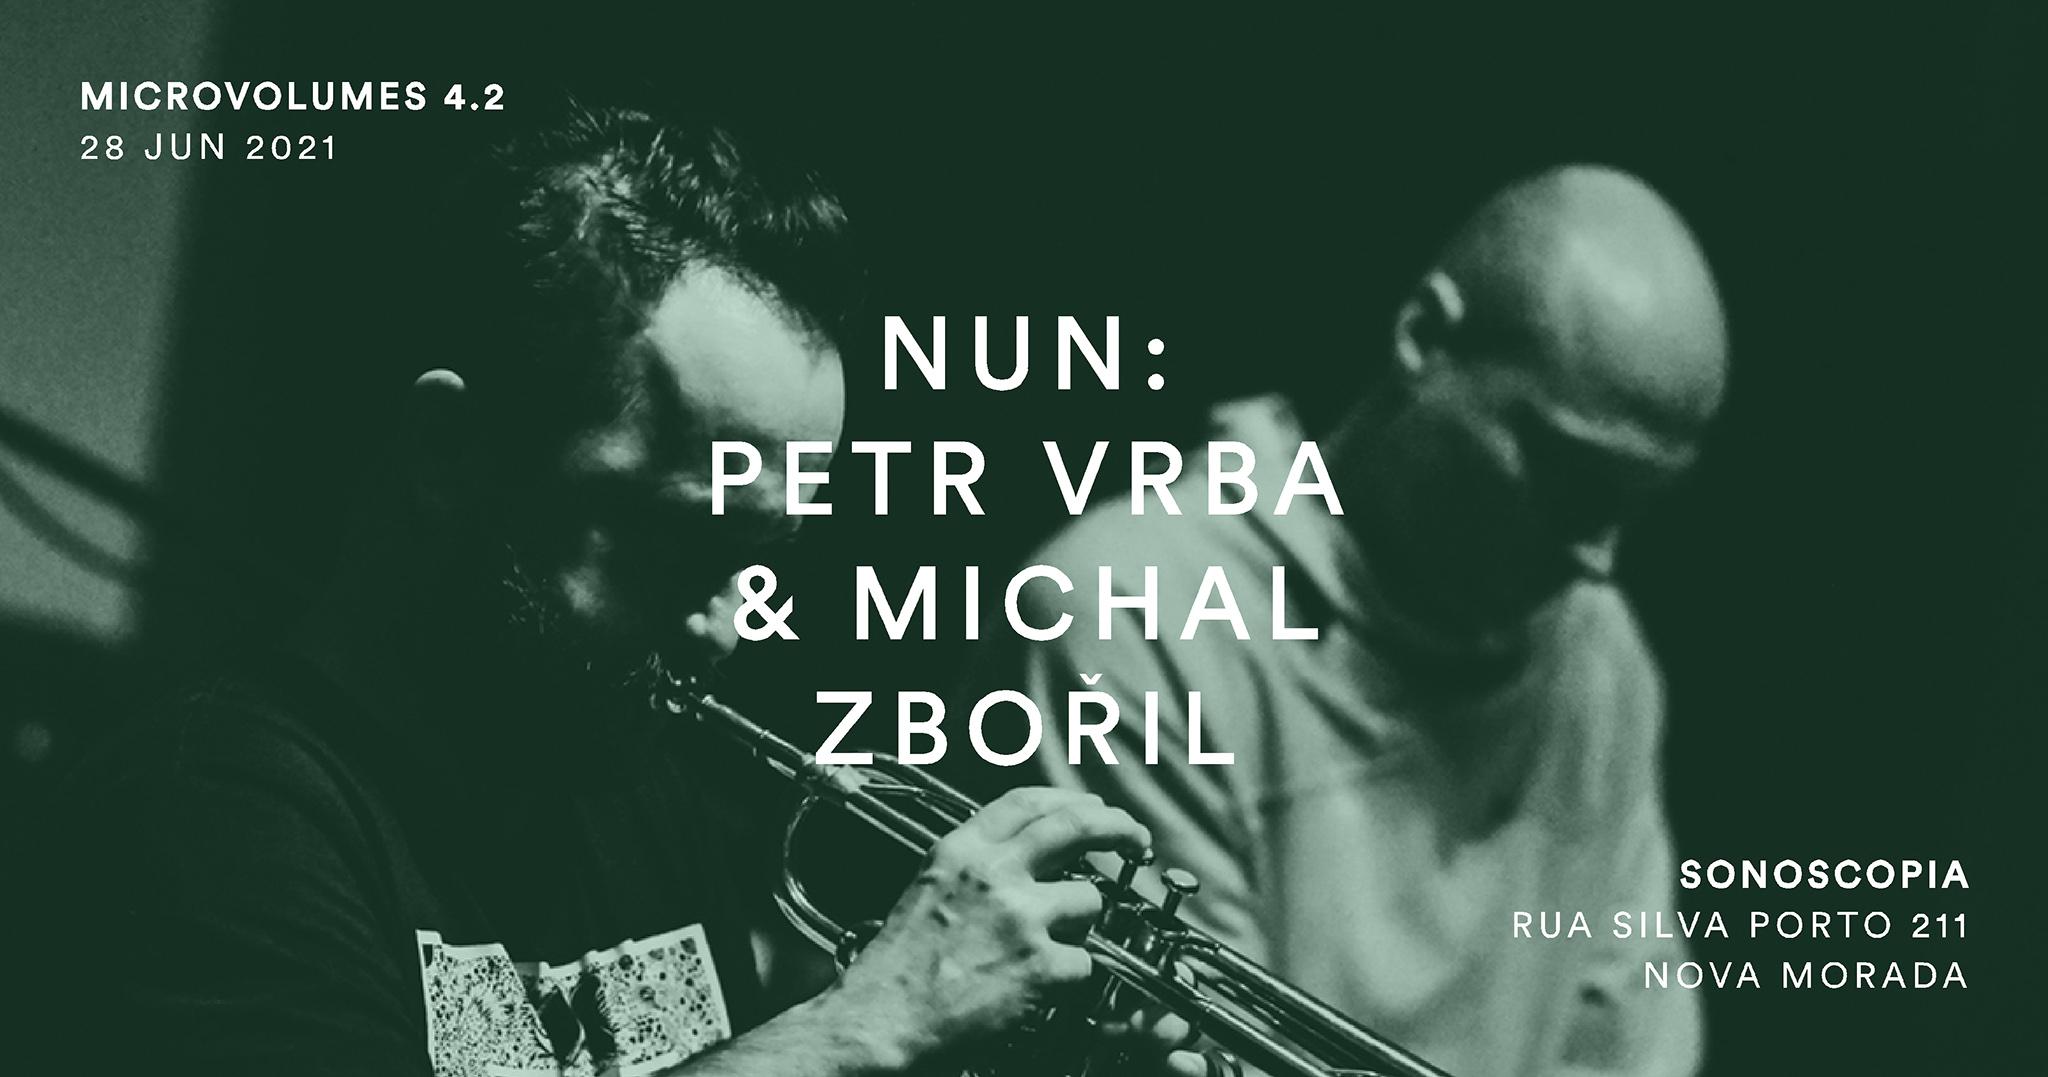 Microvolumes 4.2 | Nun: Petr Vrba & Michal Zbořil